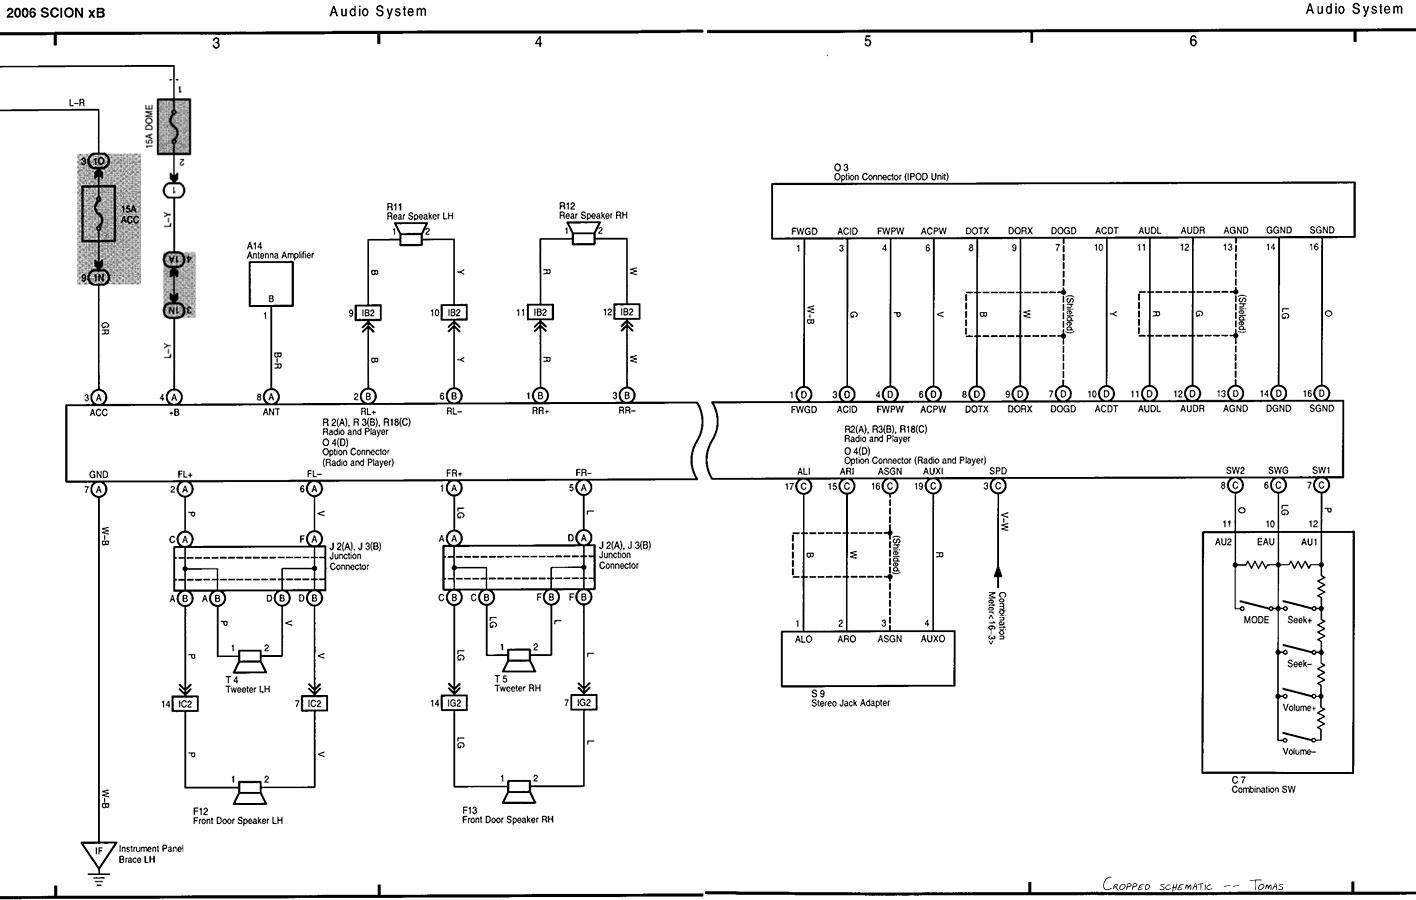 1988 corvette ac wiring diagram free download [ 1416 x 900 Pixel ]